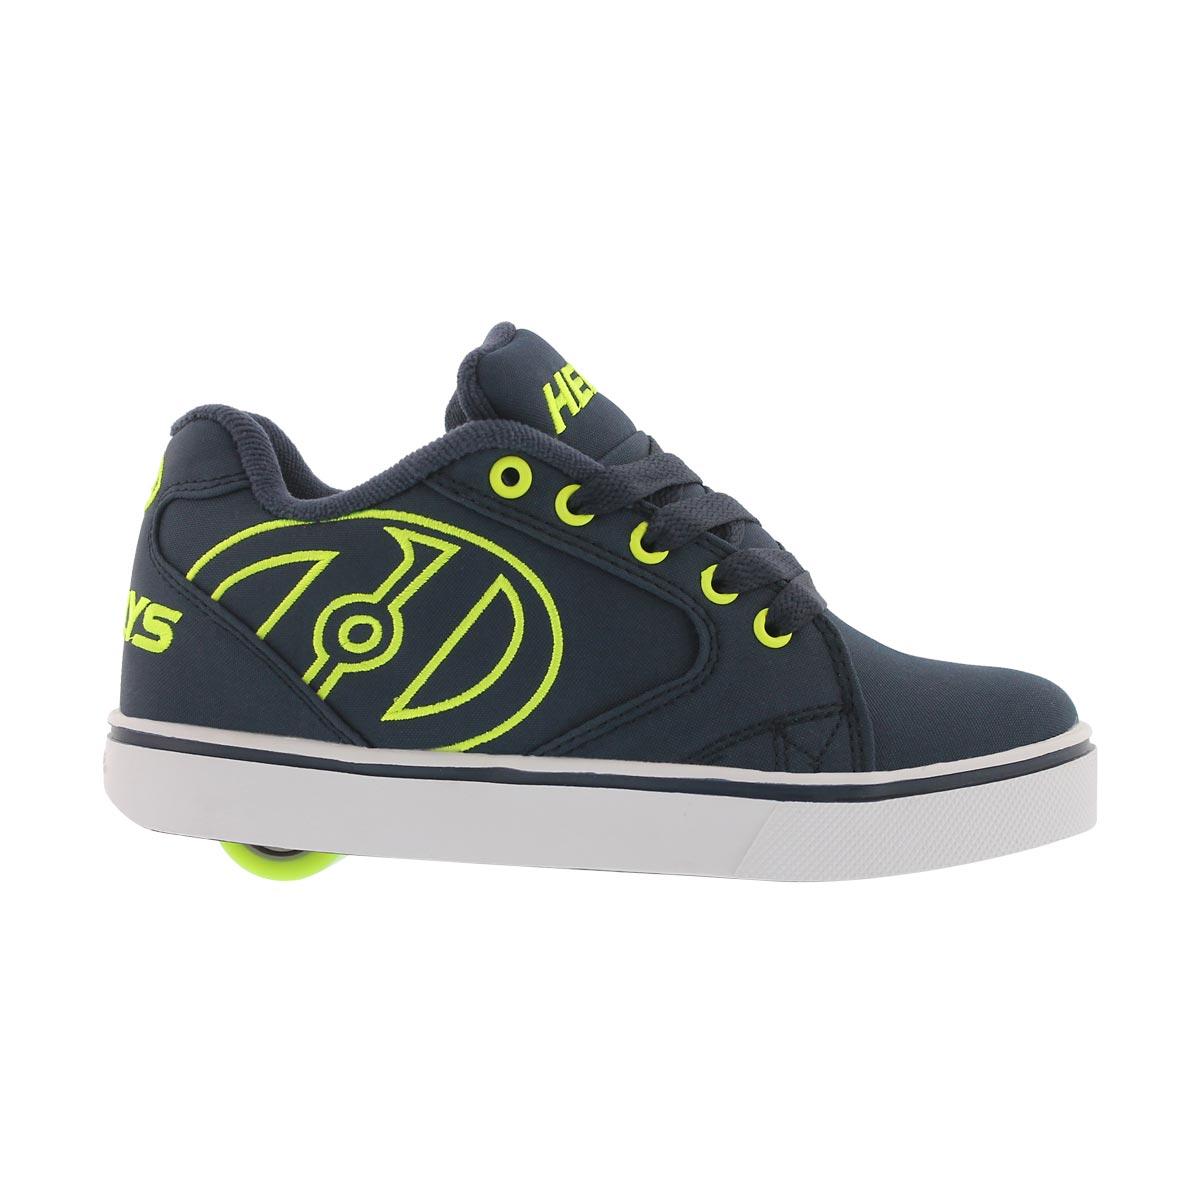 Bys Vopel nvy/bright ylw skate sneaker